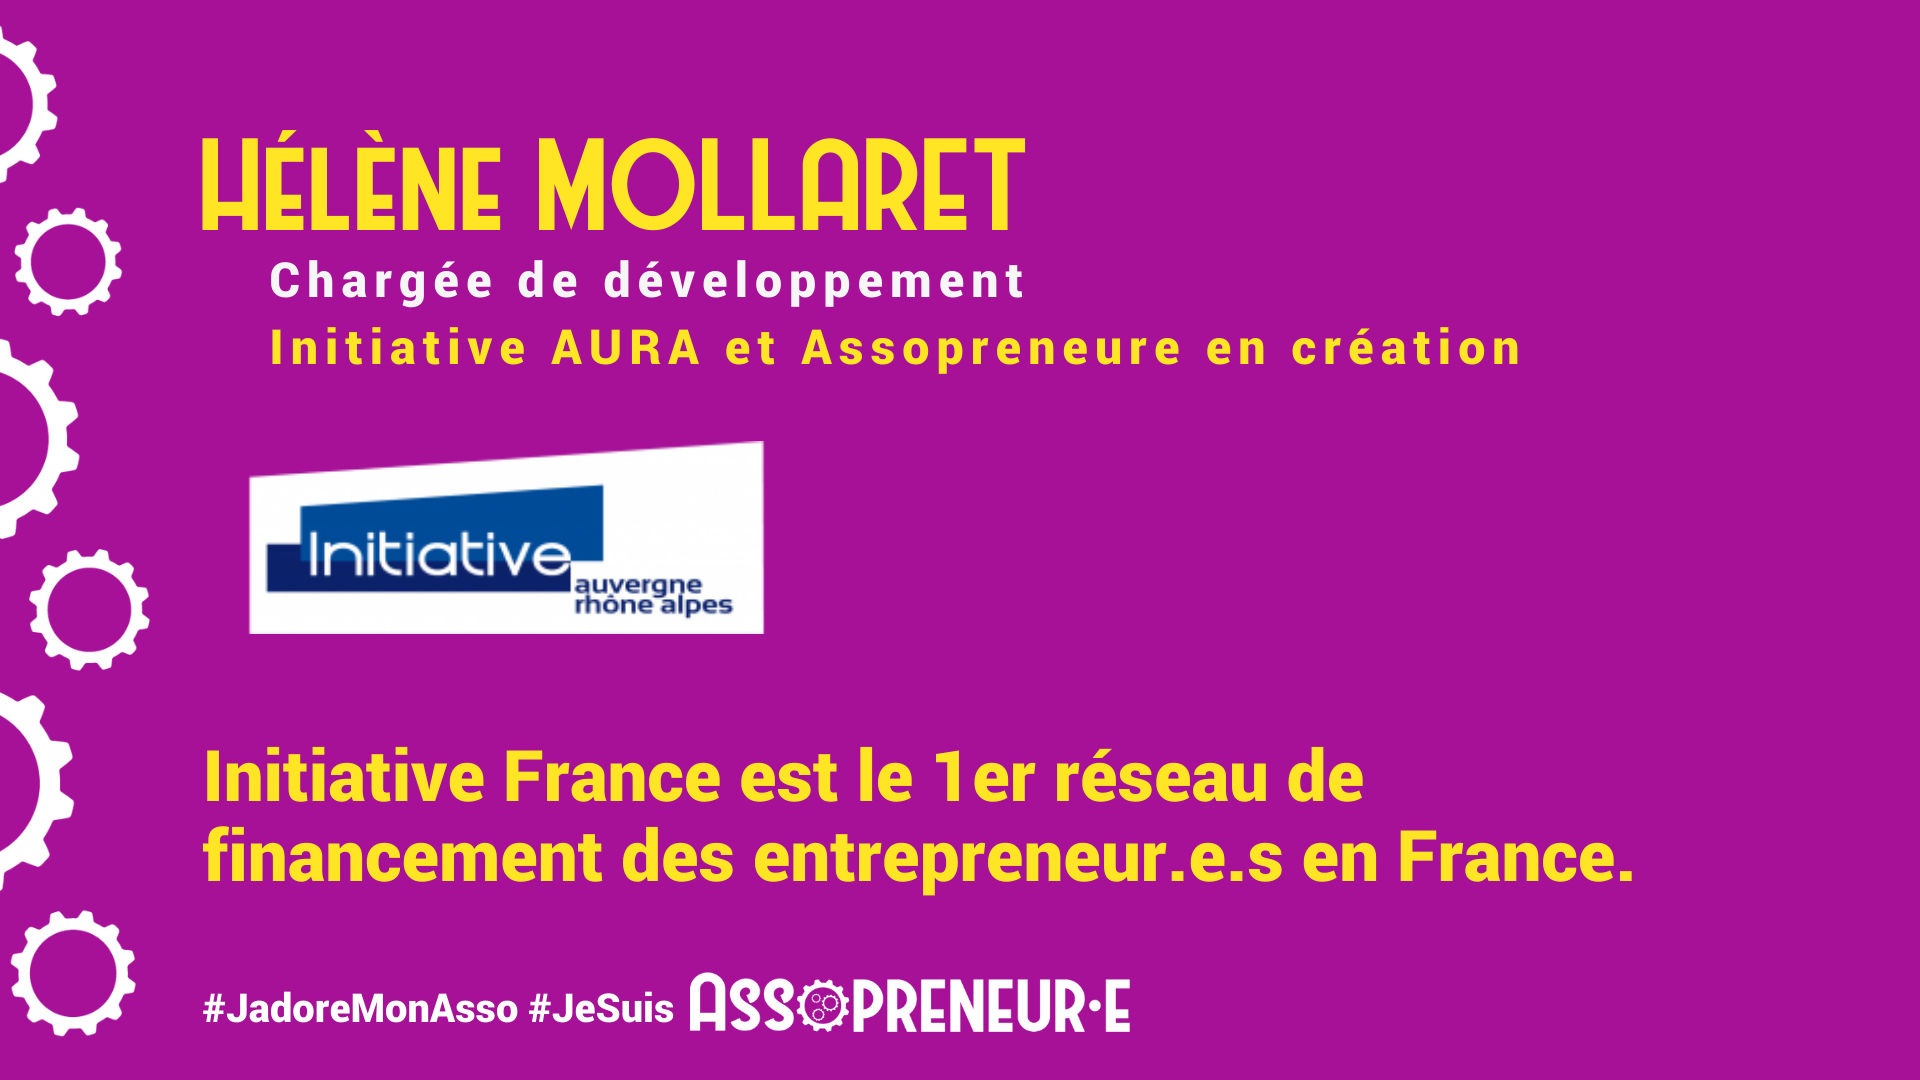 Helene Mollaret membre programme Assopreneur